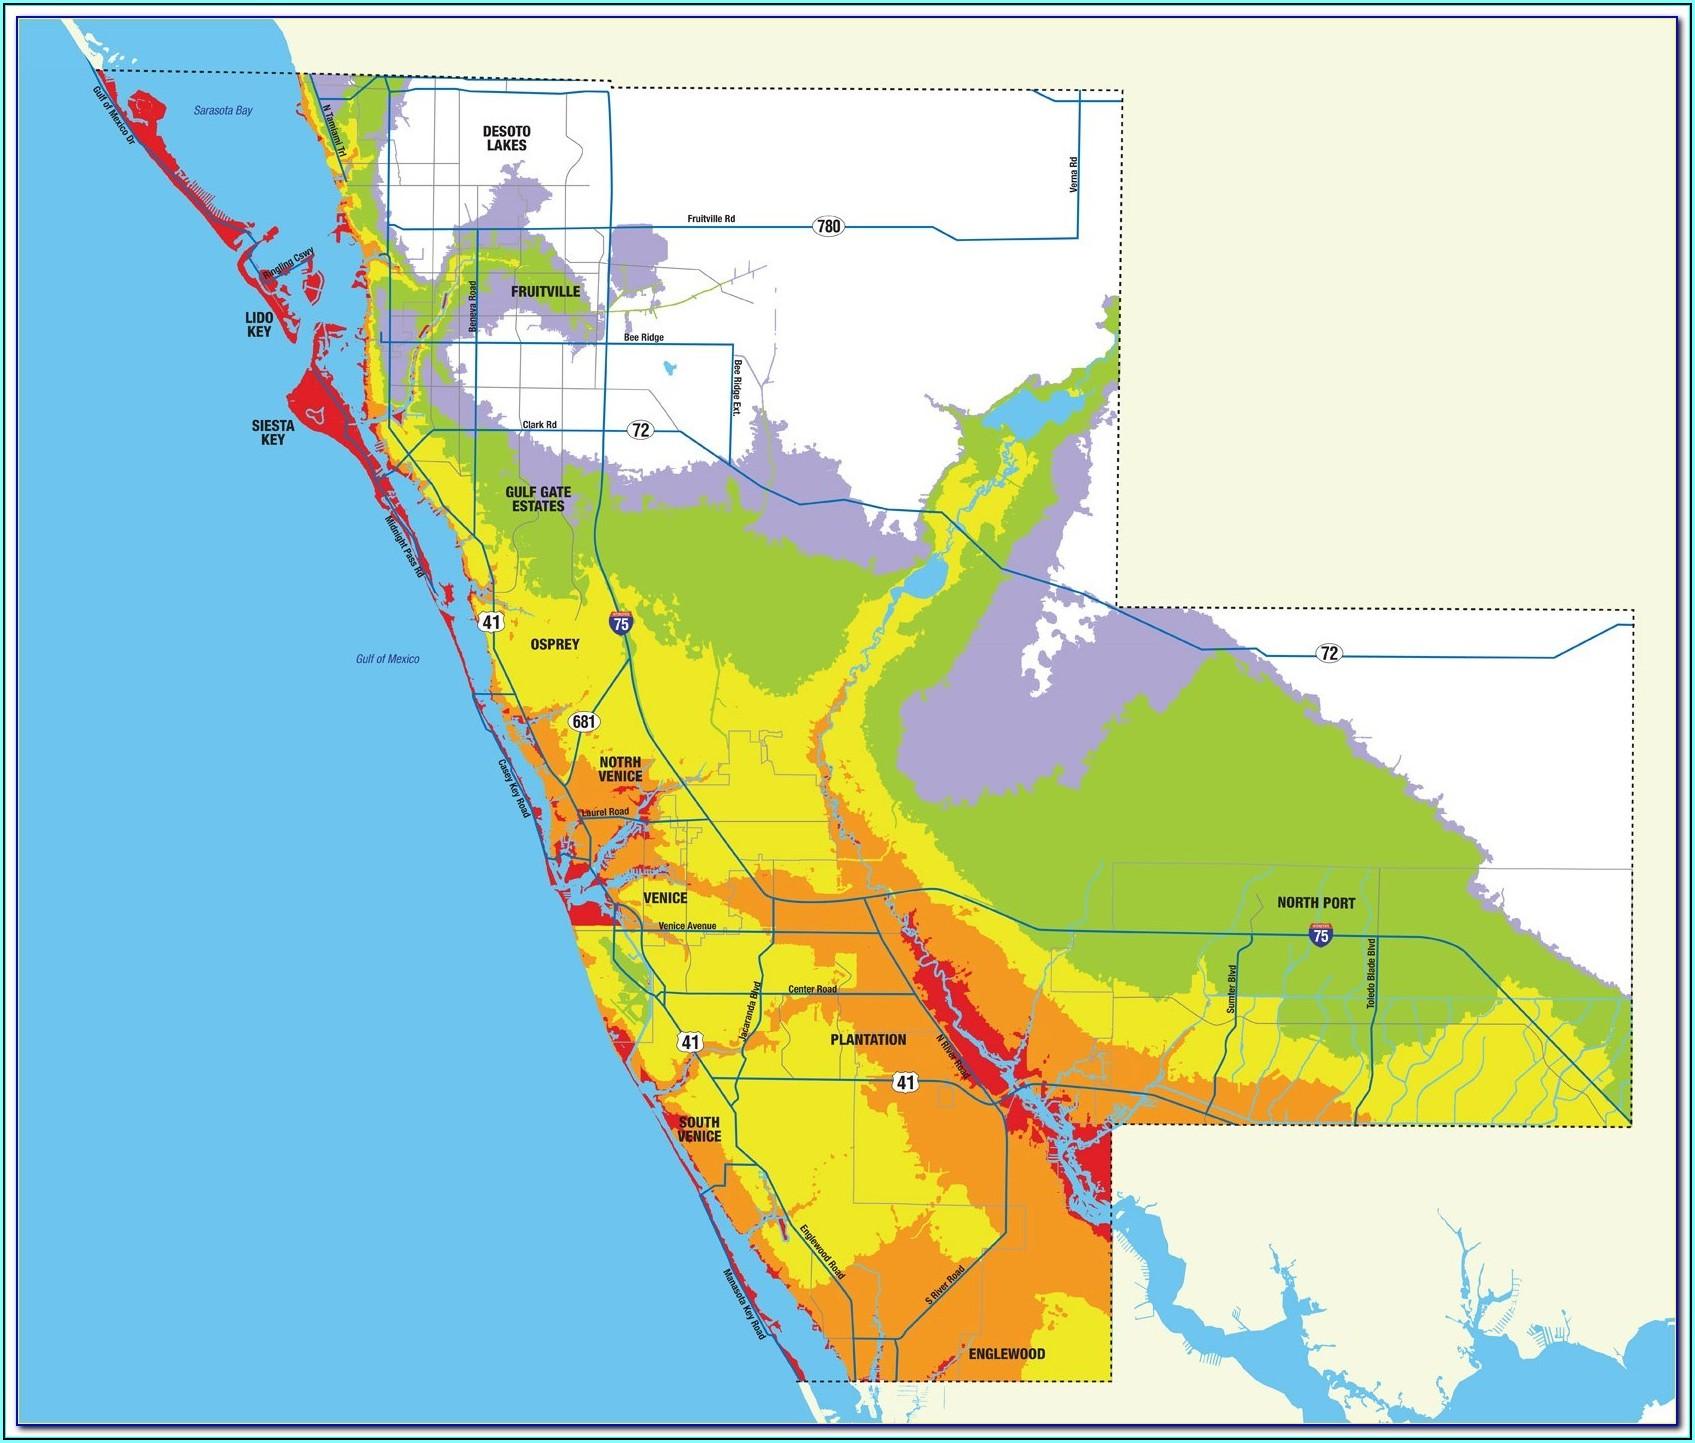 Florida Flood Zone Map Orange County